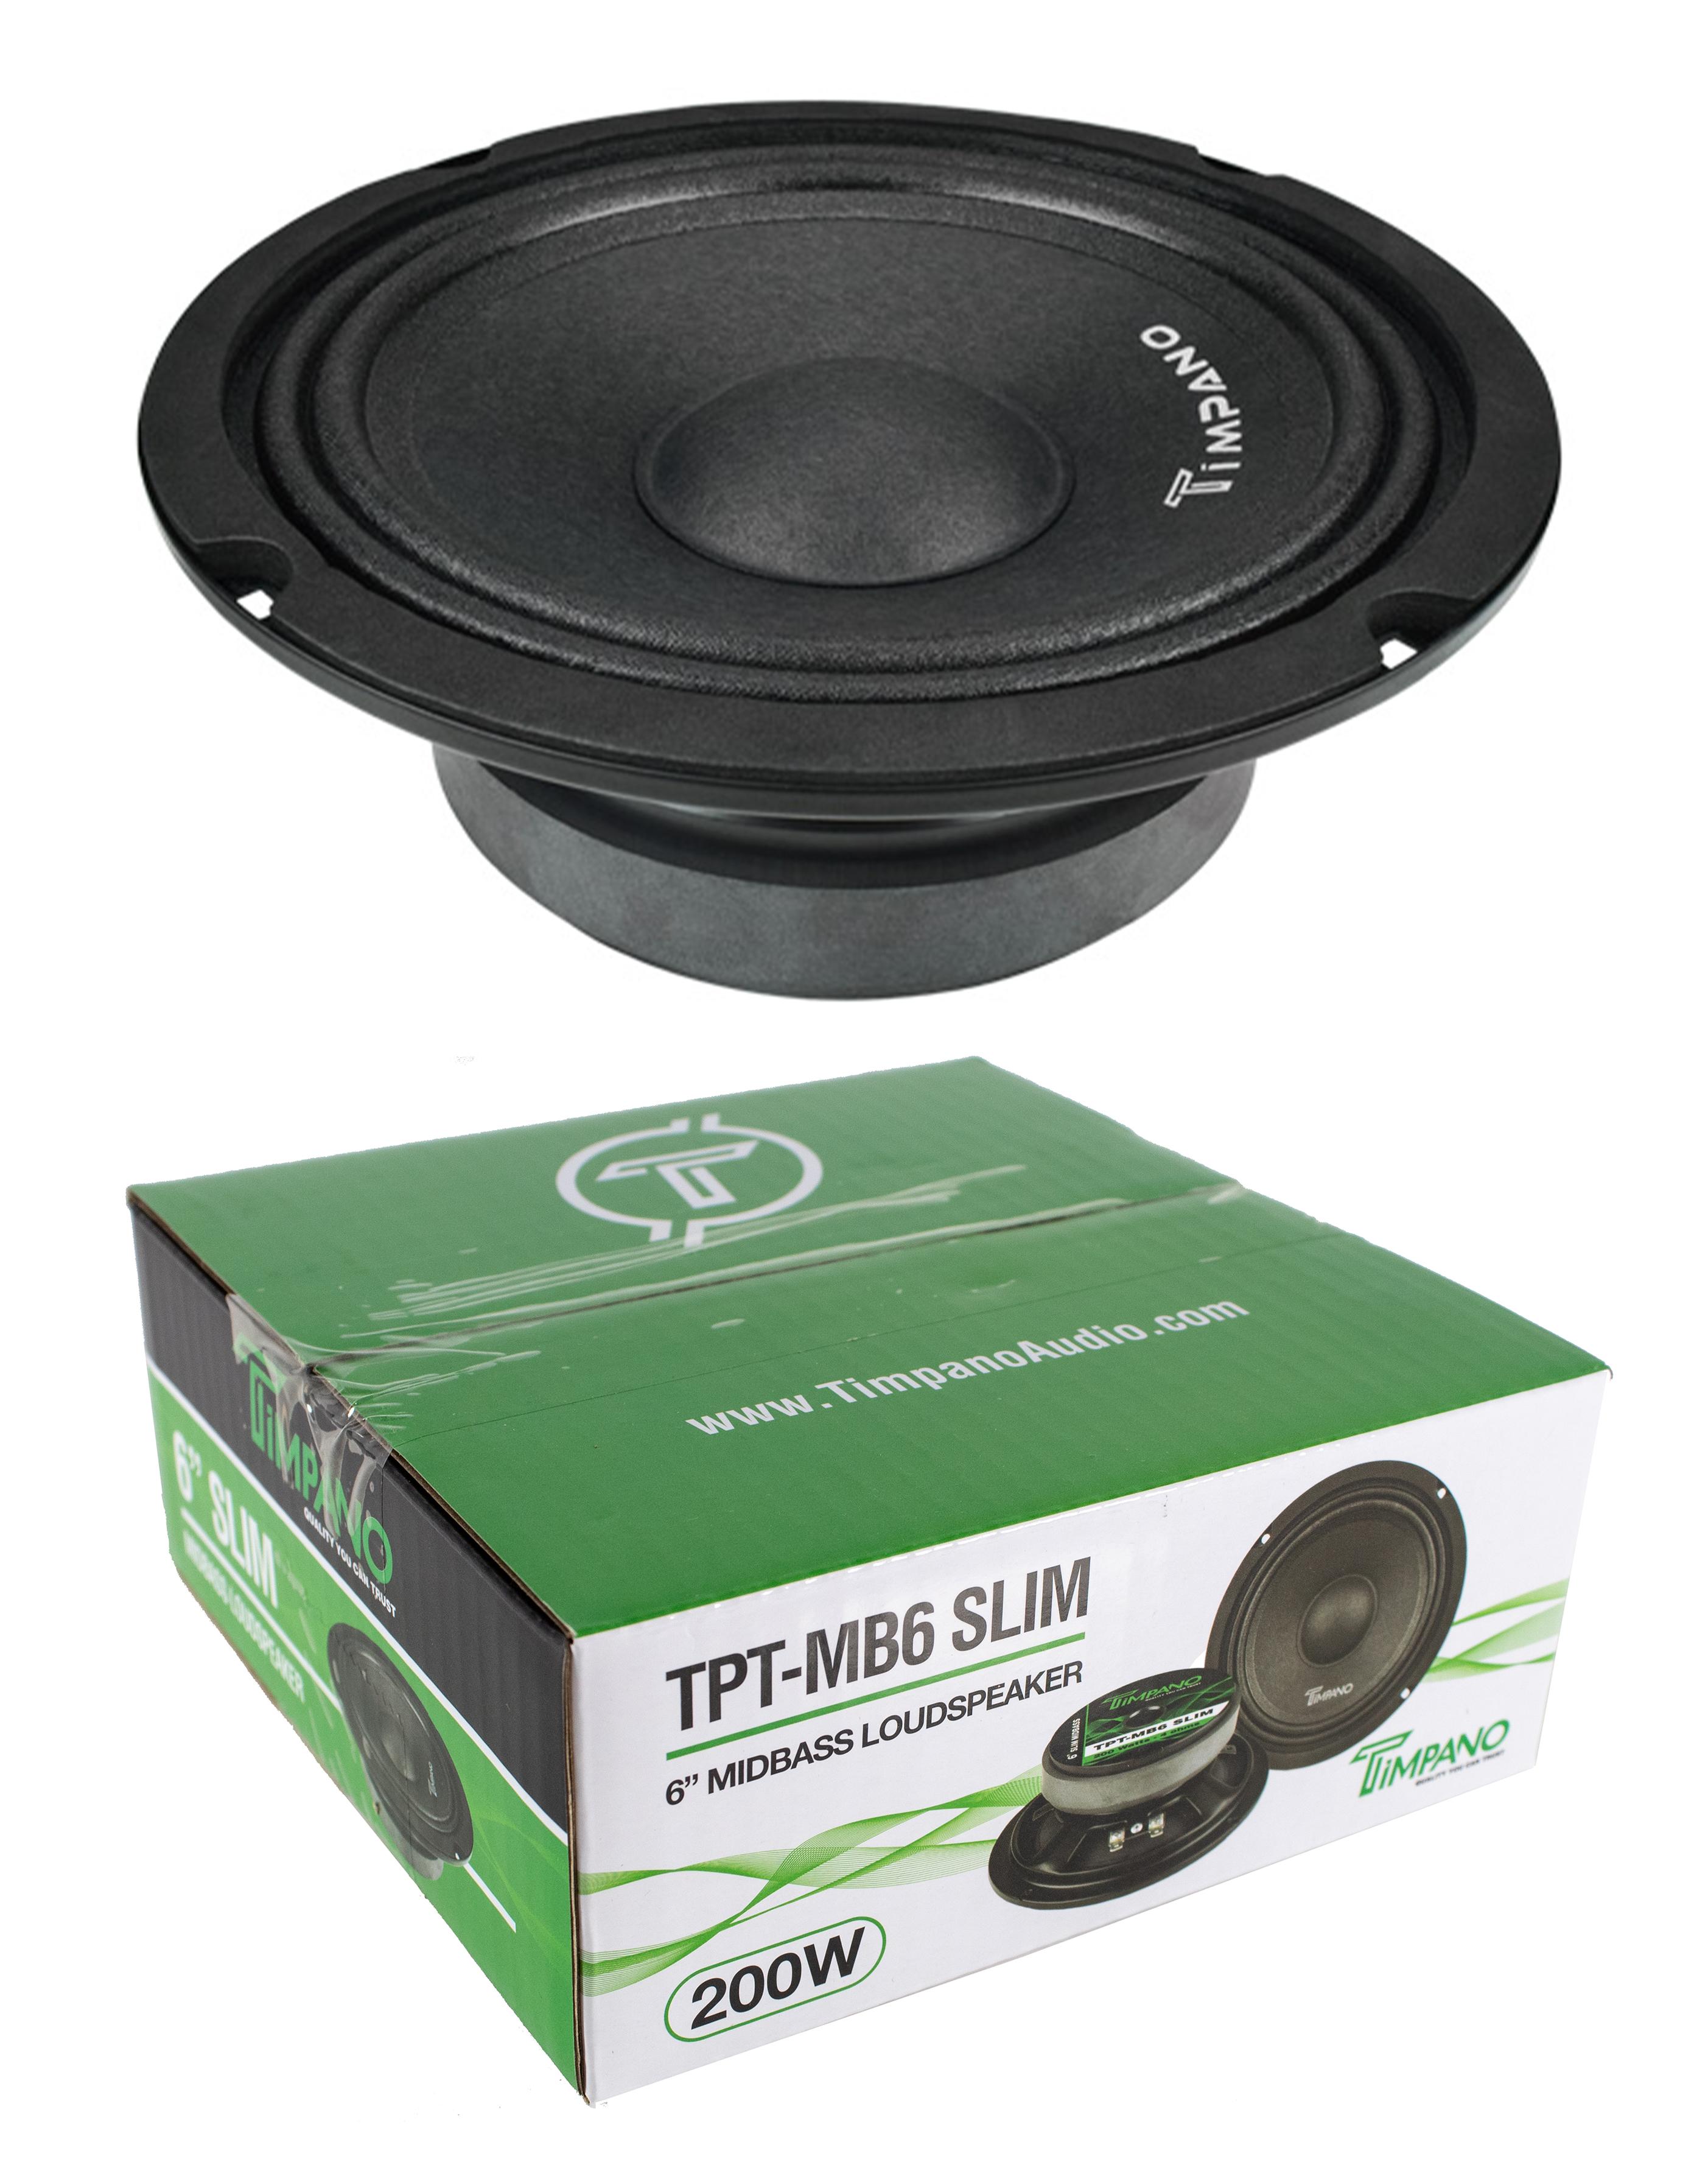 2 Timpano TPT-MD8 Full Range Mid Bass Loud Speaker 8 8 Ohm 520W Peak Pair